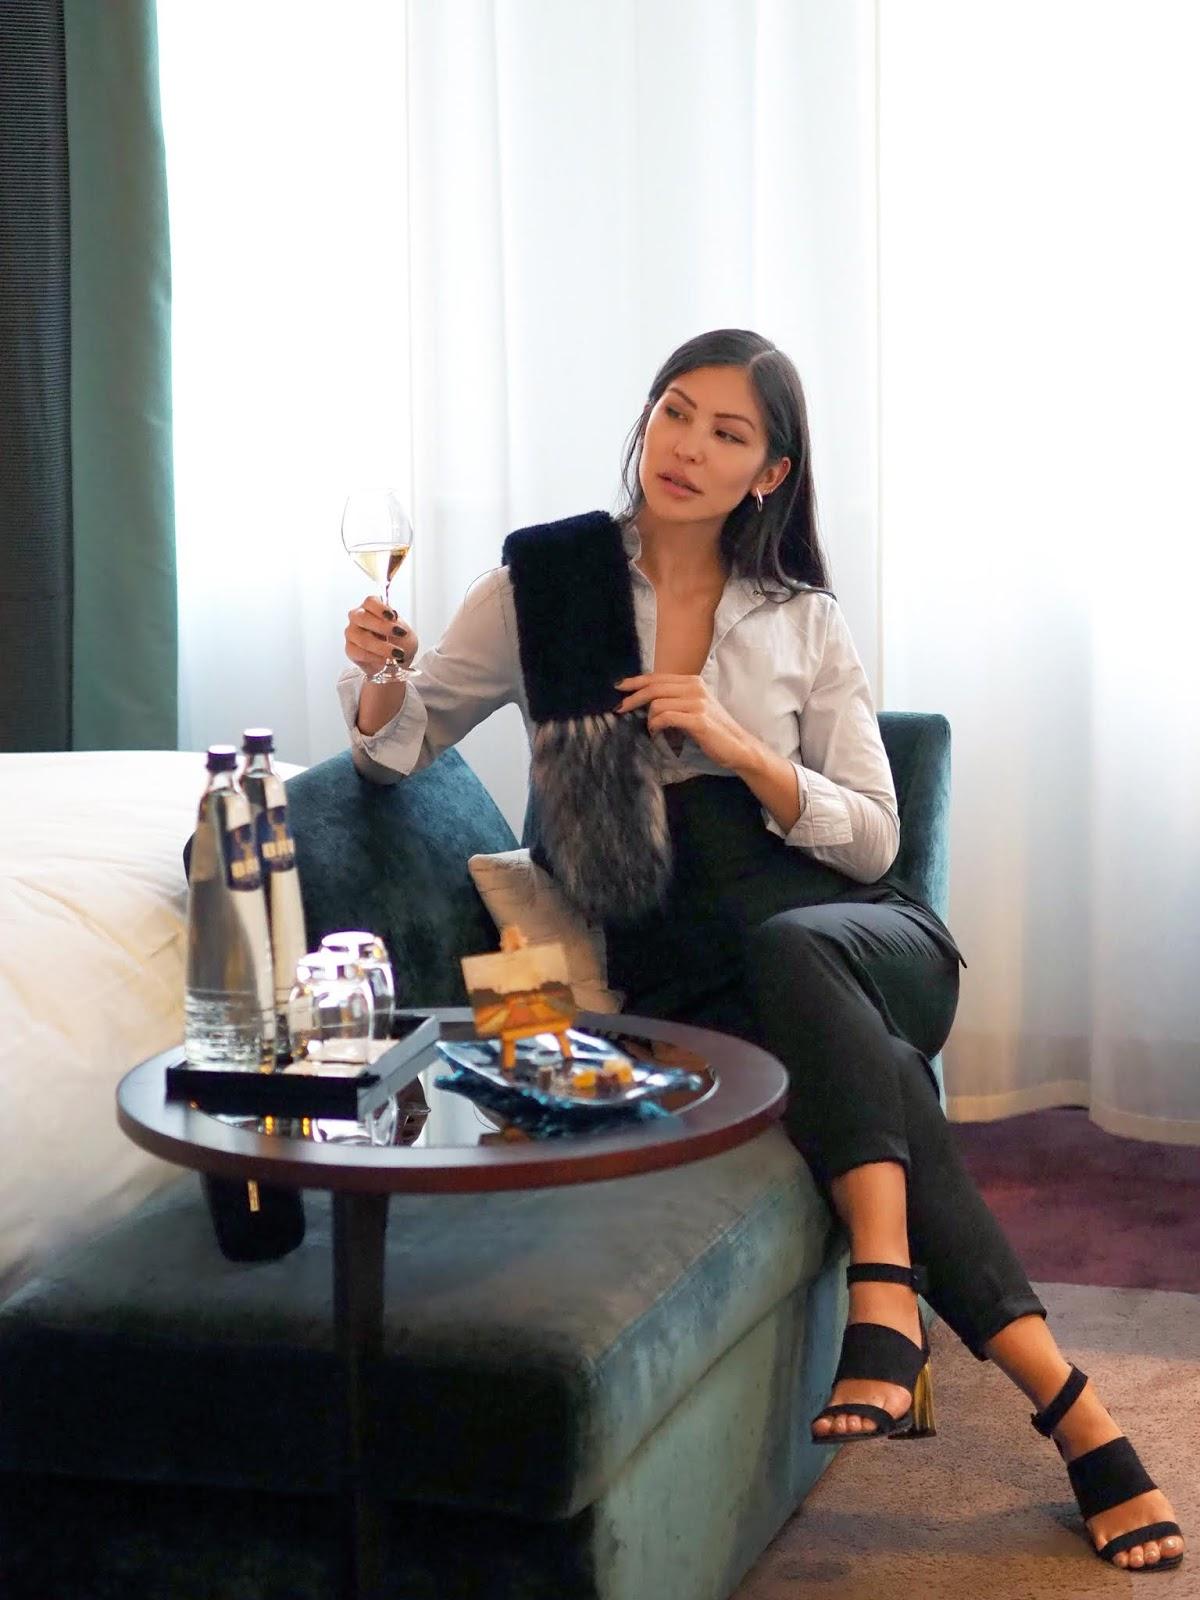 Euriental | luxury travel & style | Sofitel Legend The Grand Amsterdam